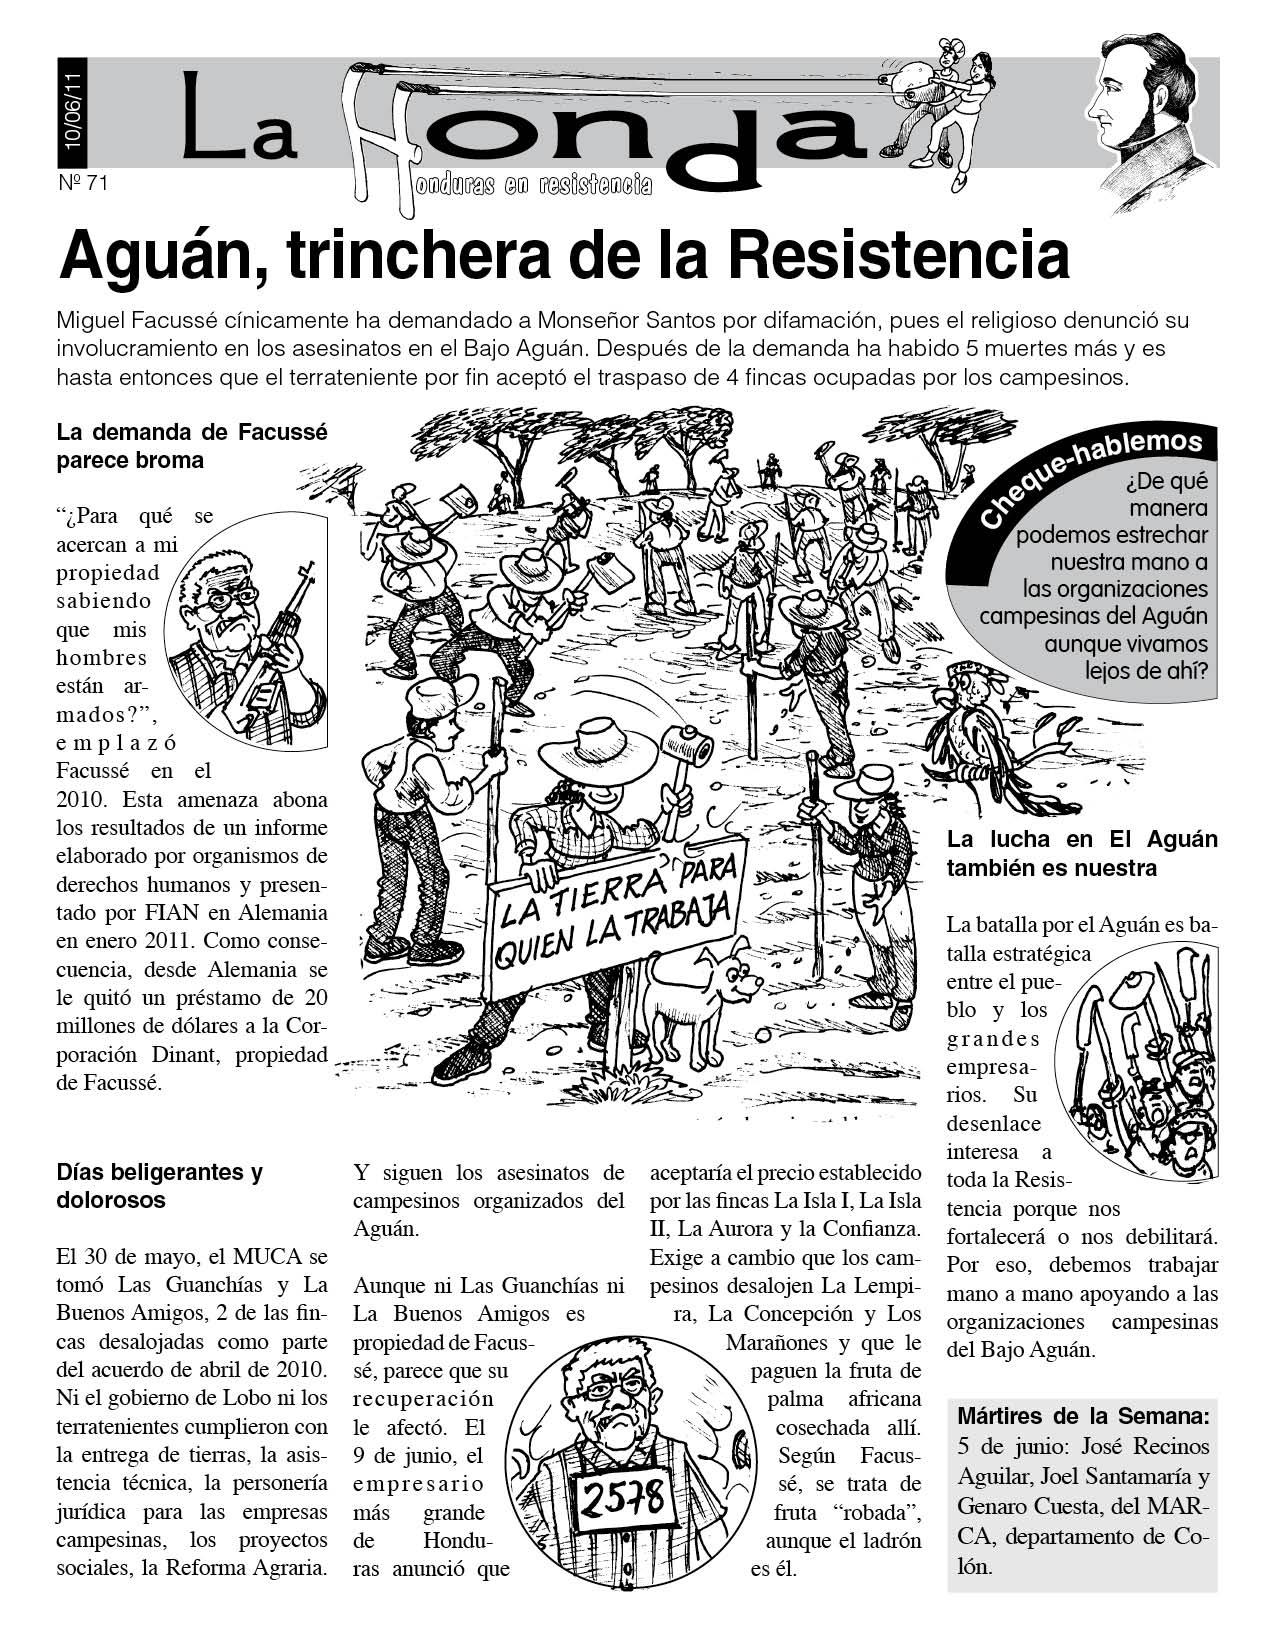 La Honda 71: Aguán, trinchera de la Resistencia